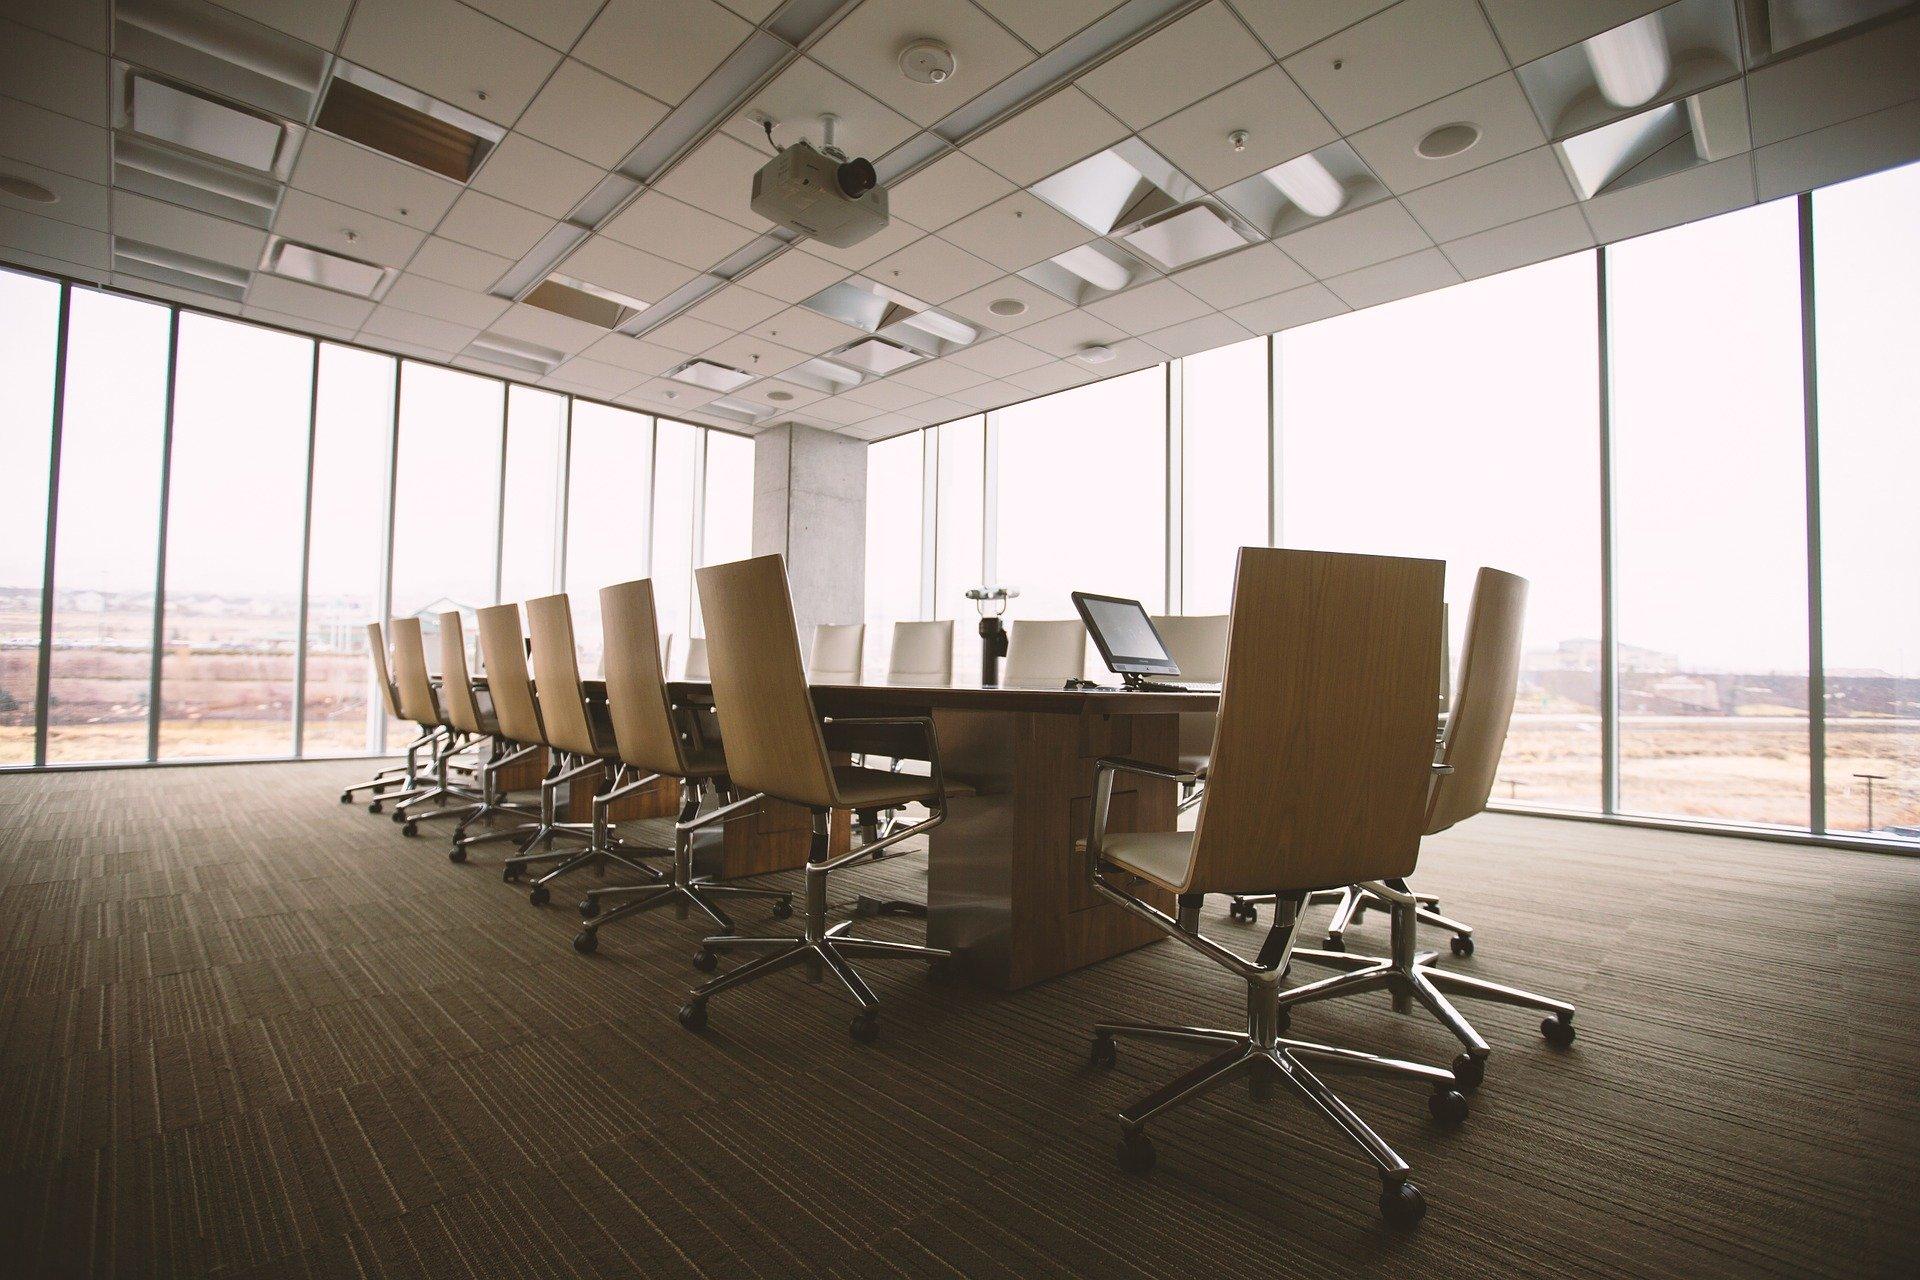 Best Ergonomic Office Chair Under 1000 October 2020